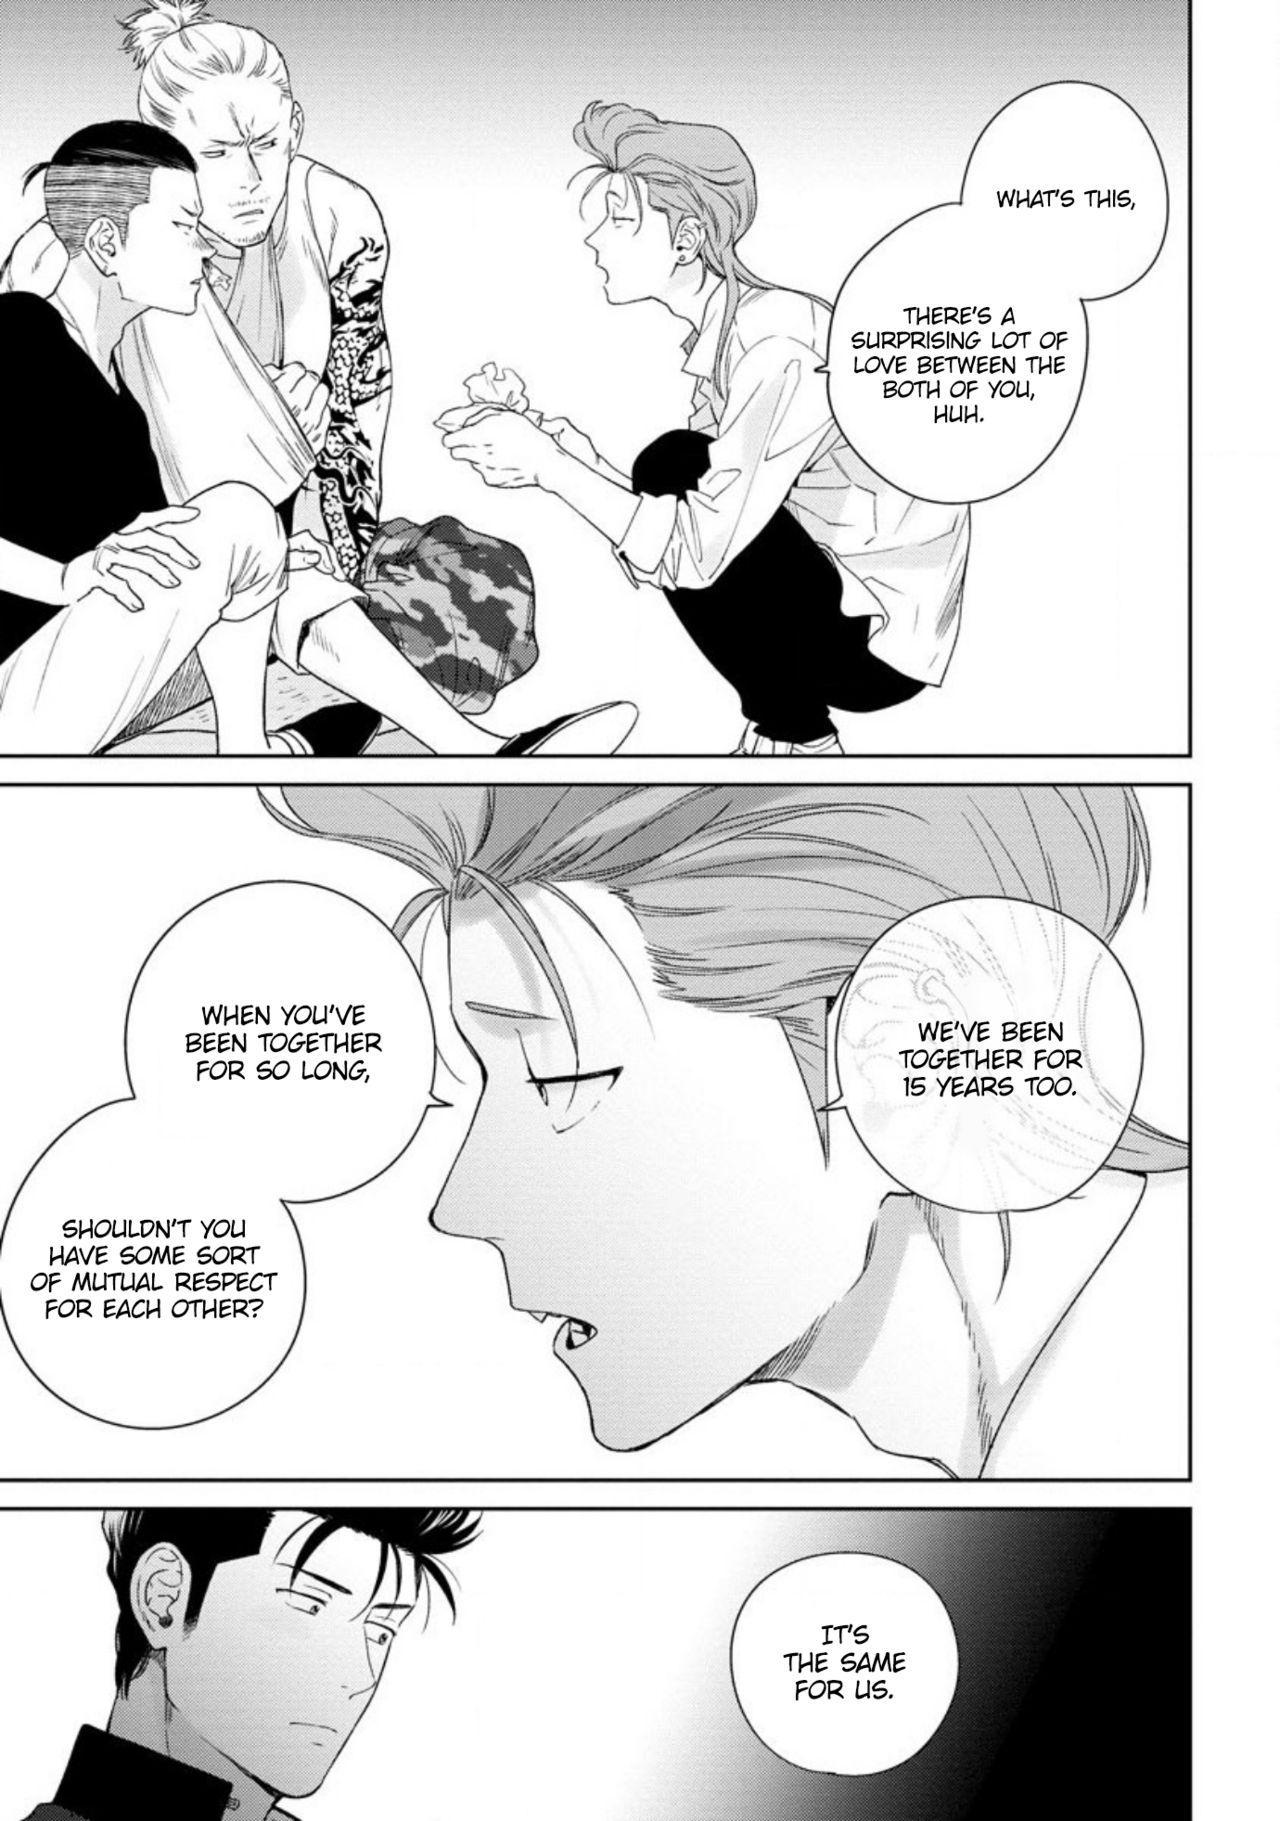 [Hiiragi Nozomu] Nakasete Yaru yo Yankee-kun   I'll Make You Cry Ch. 1-5 + Extras [English] [Digital] 165